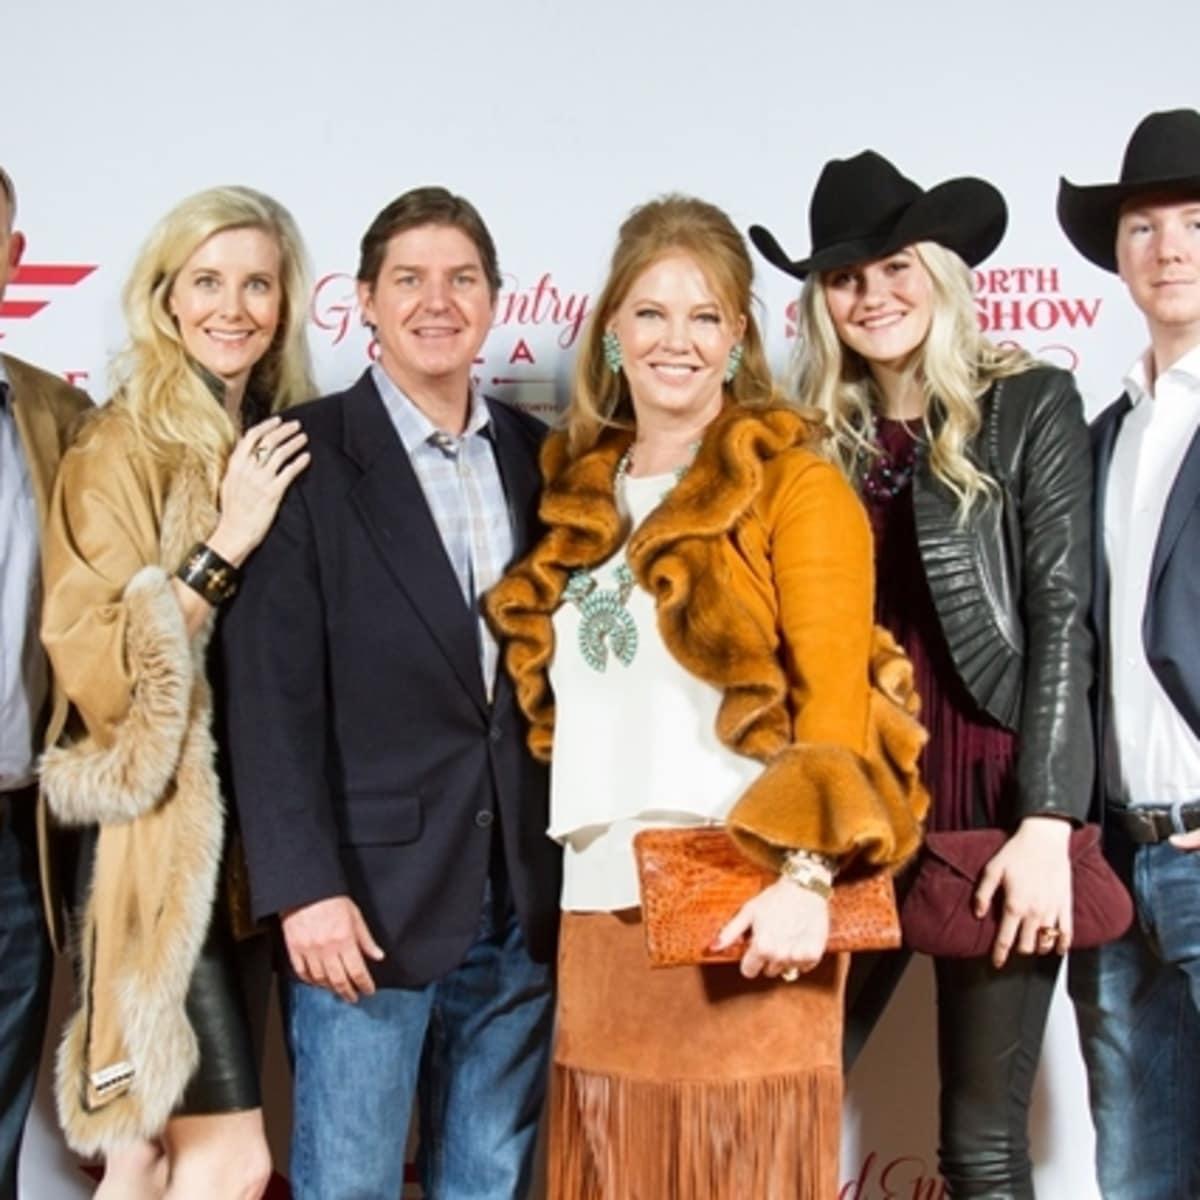 Fort Worth, JLH Grand Entry Gala, January 2018, Colin Bailey, Sonia Bailey, Philip Williamson, Jennifer Williamson, Talia Bailey, Philip Williamson, Jr.